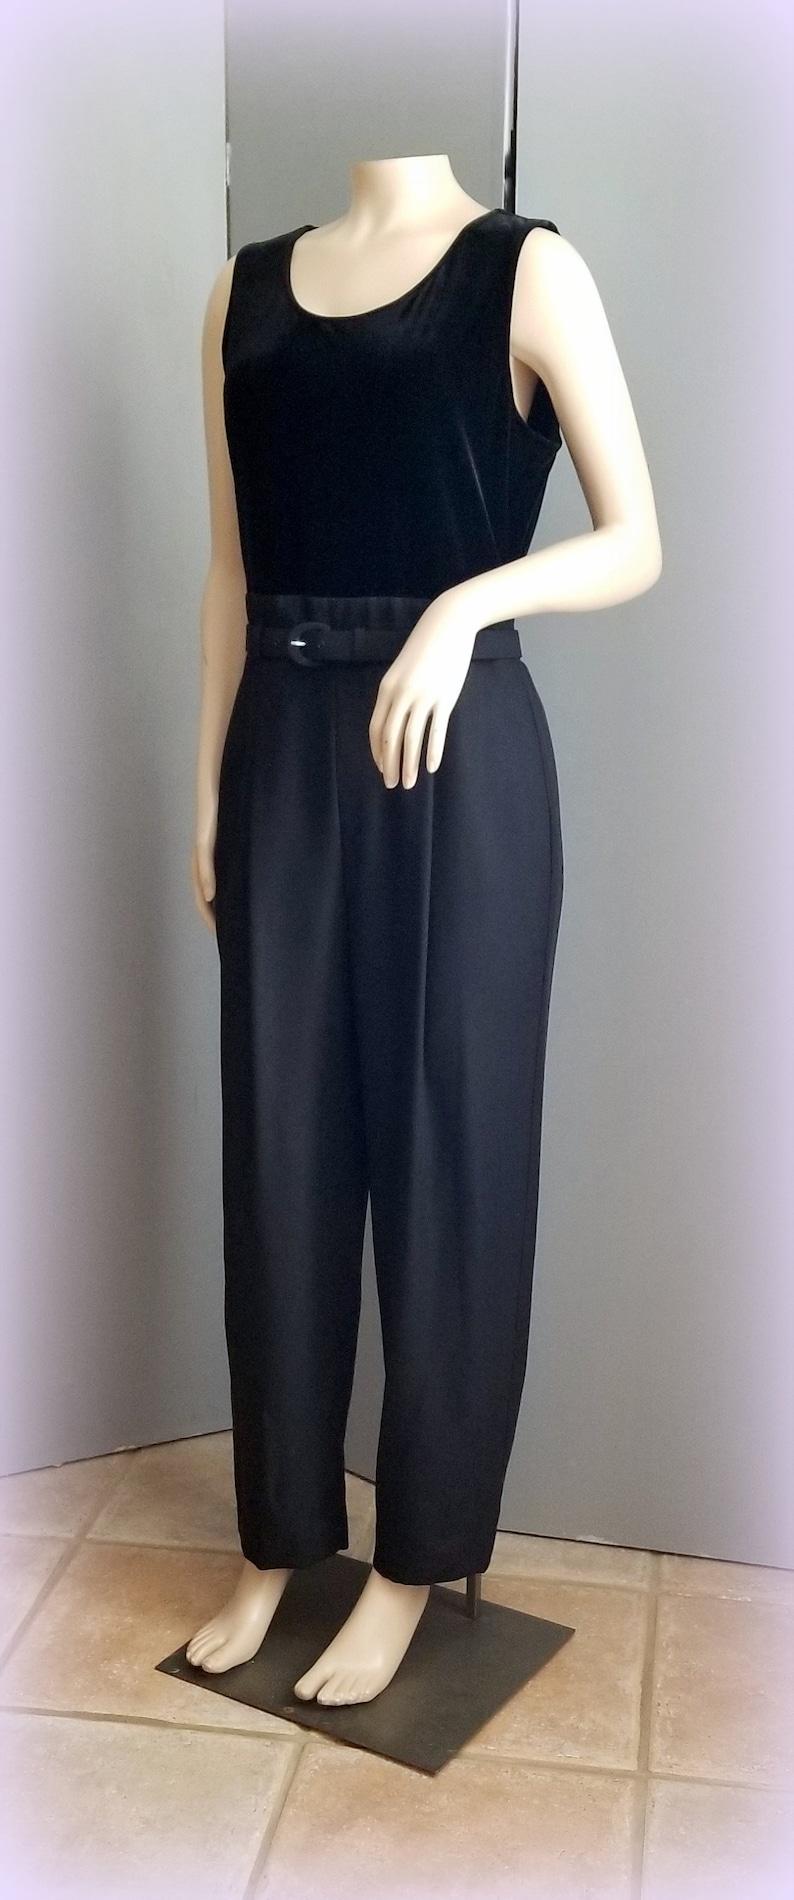 Vintage Jumpsuit 90s Black Jumpsuit /& Jacket JOHN ROBERTS Glittered Sheer Jacket Size SMALL Crepe Pants  Velour Bodice